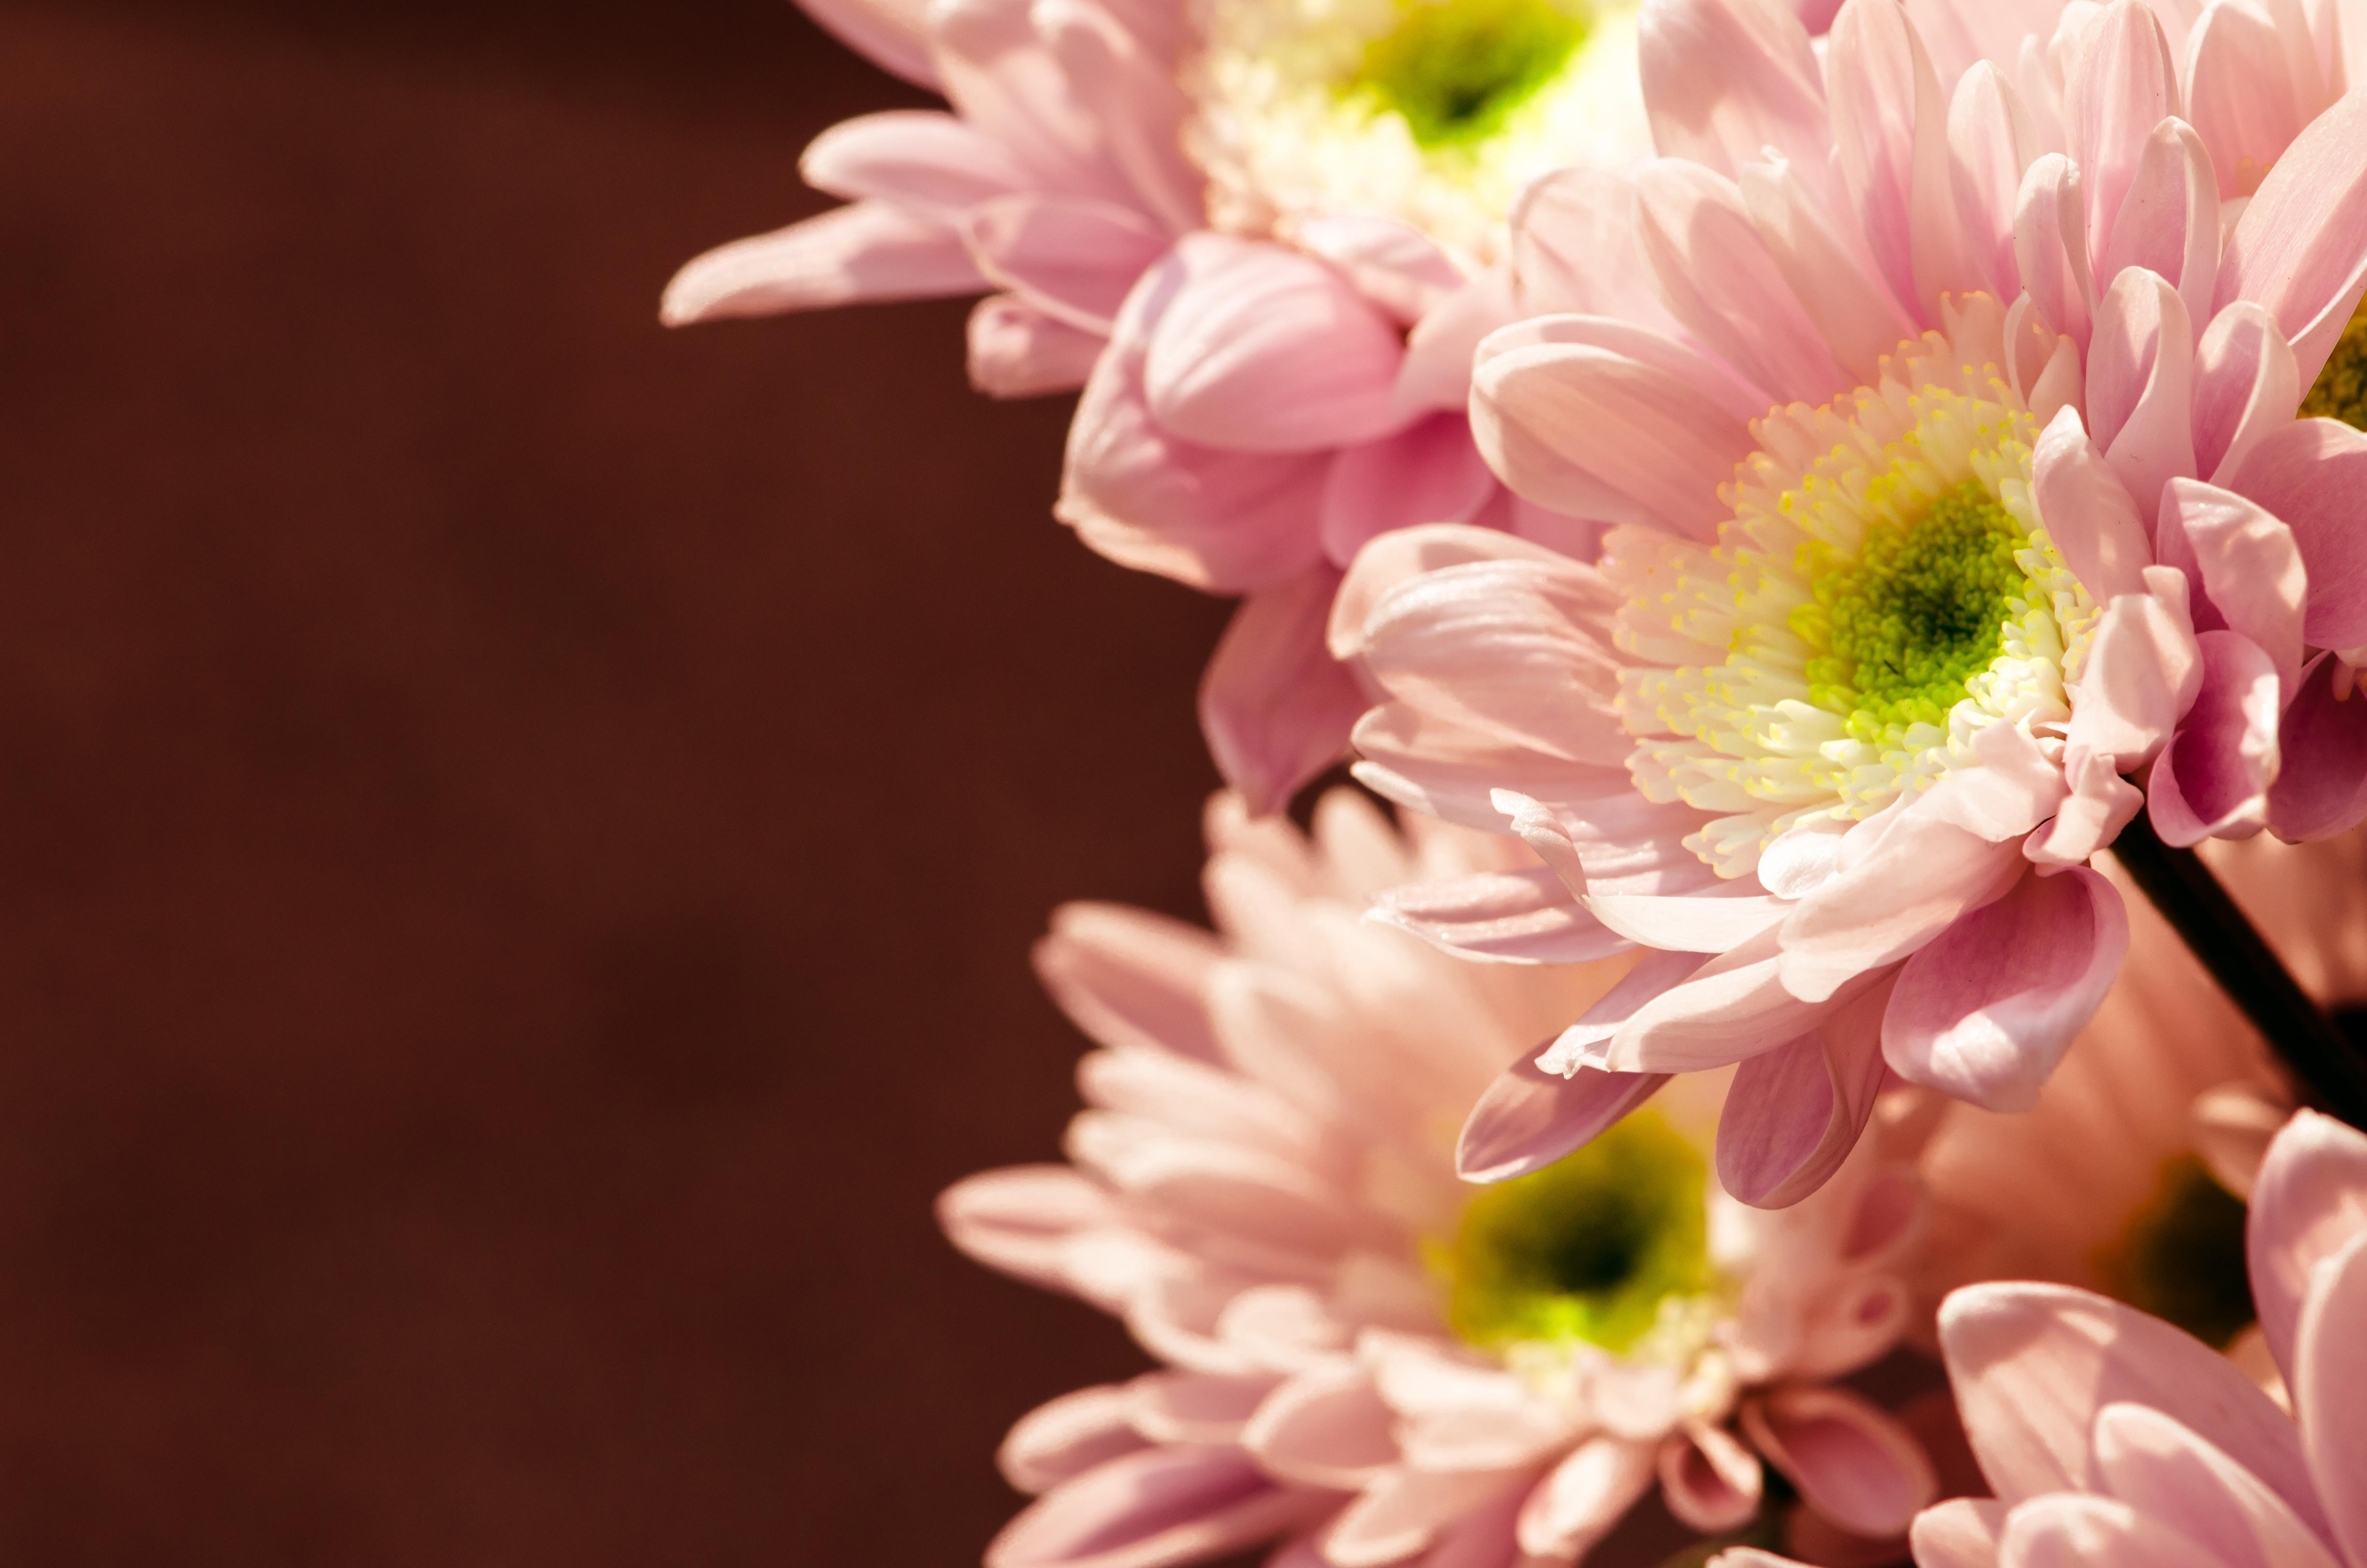 Florist atlanta ga flower shop near me vann jernigan florist call our flower shop at 404 881 9790 for beautiful floral arrangements izmirmasajfo